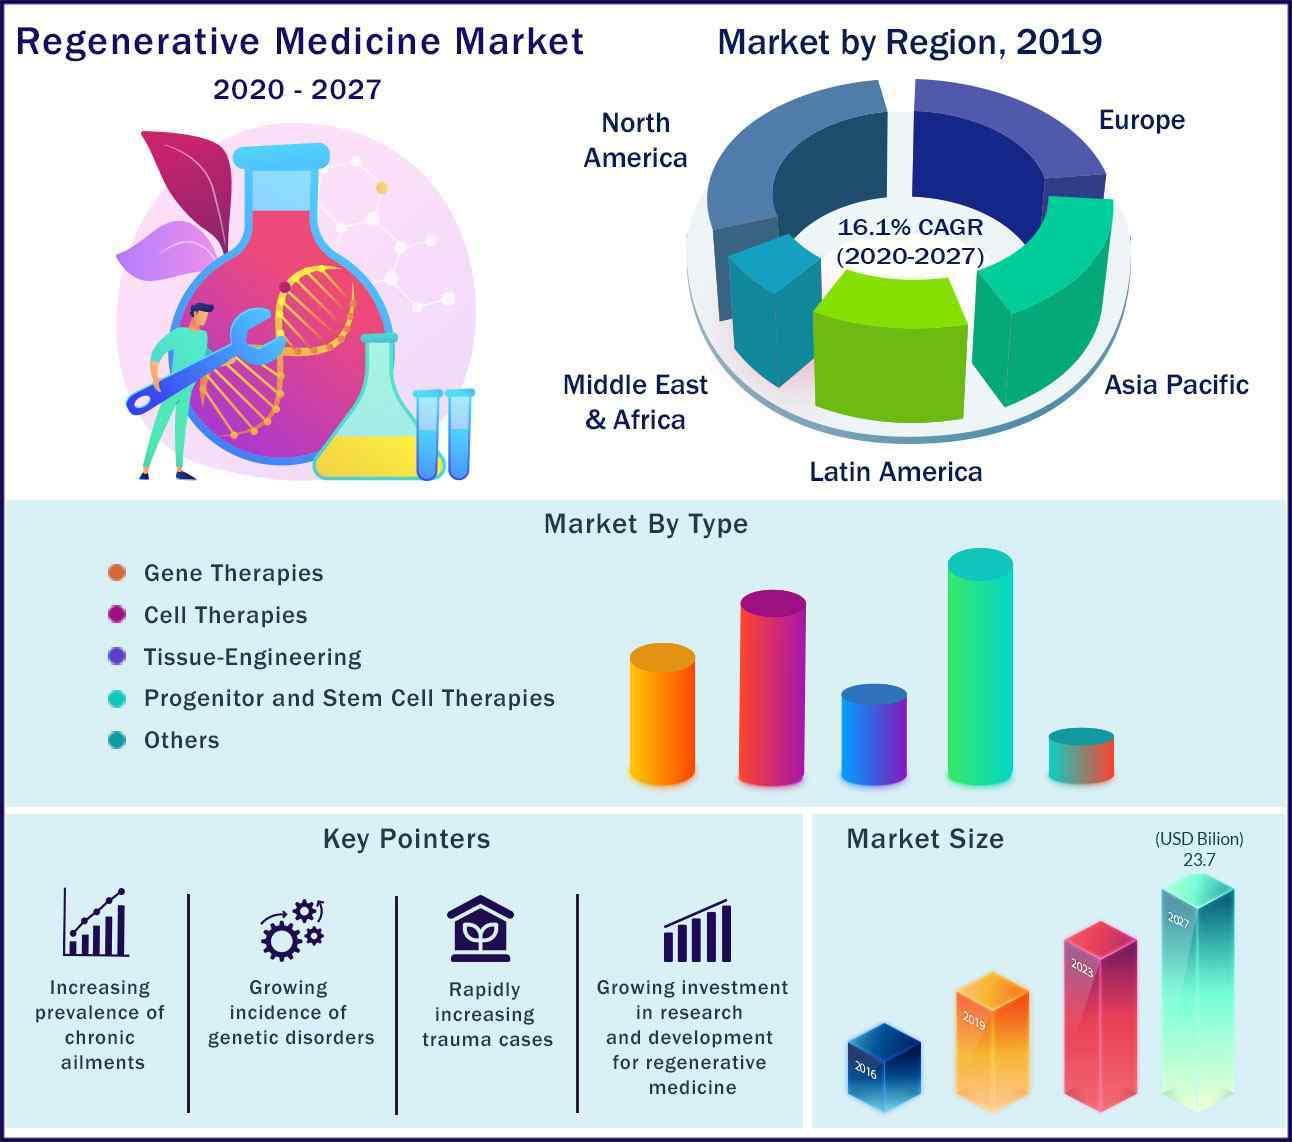 Global Regenerative Medicine Market 2020-2027